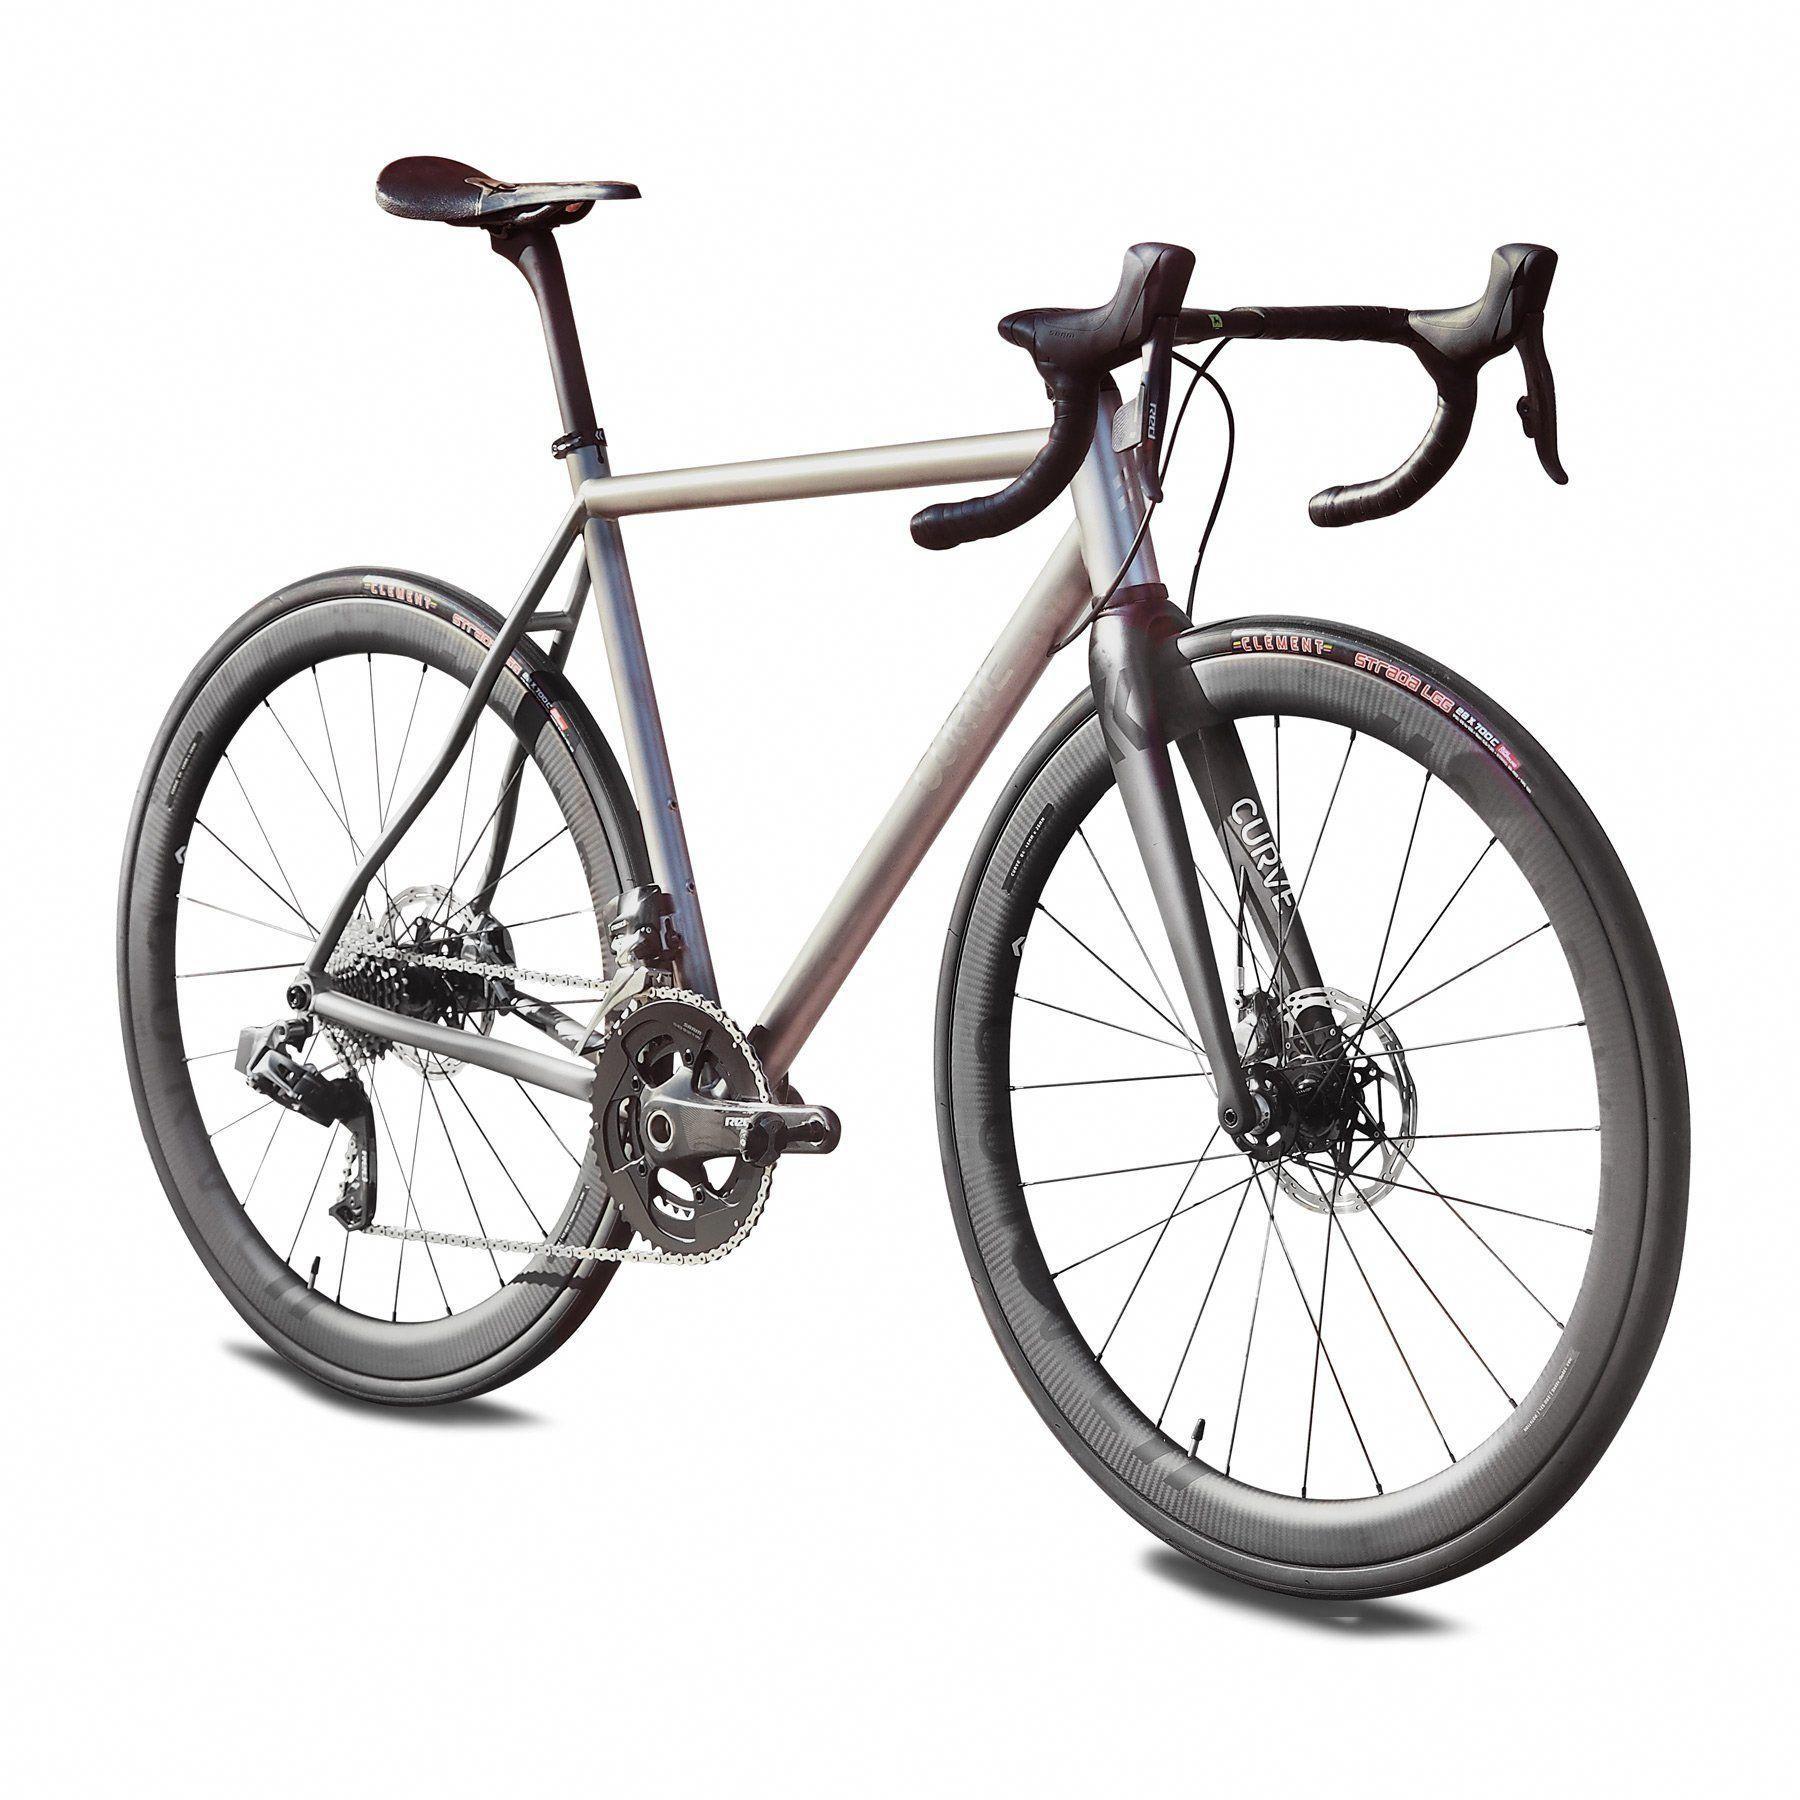 Bicycle Maintenance Titanium Road Bike Titanium Bike Road Bike